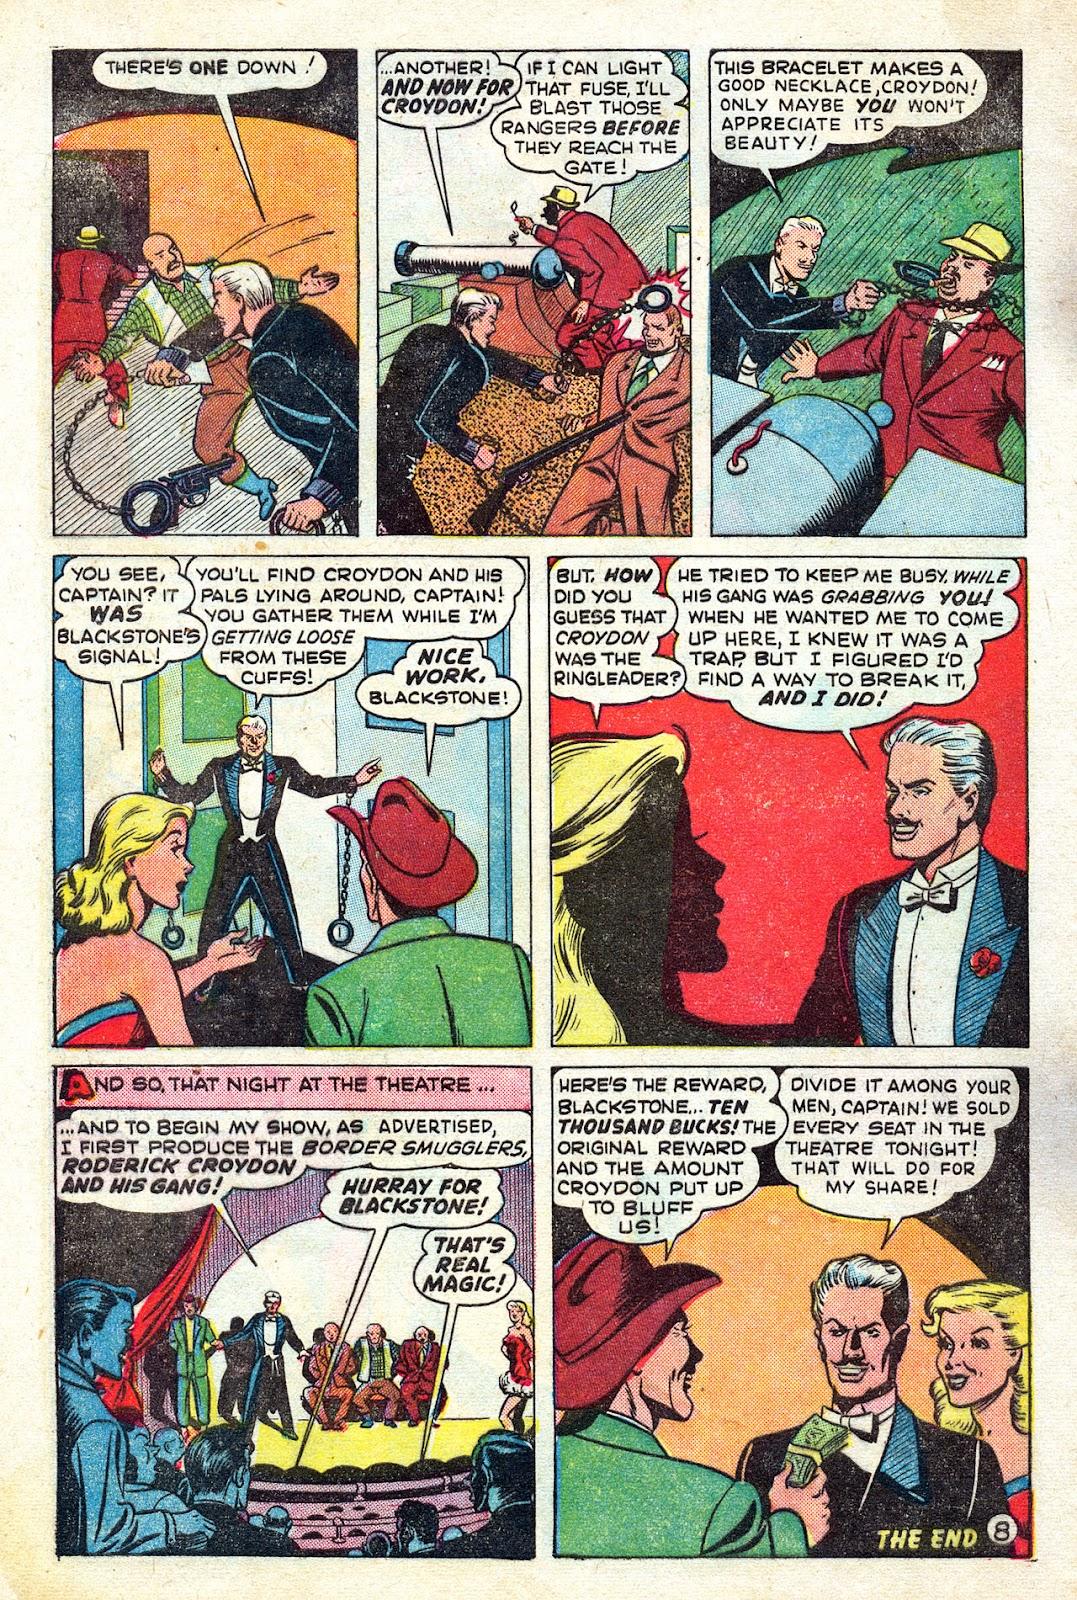 Read online Blackstone the Magician comic -  Issue #4 - 10